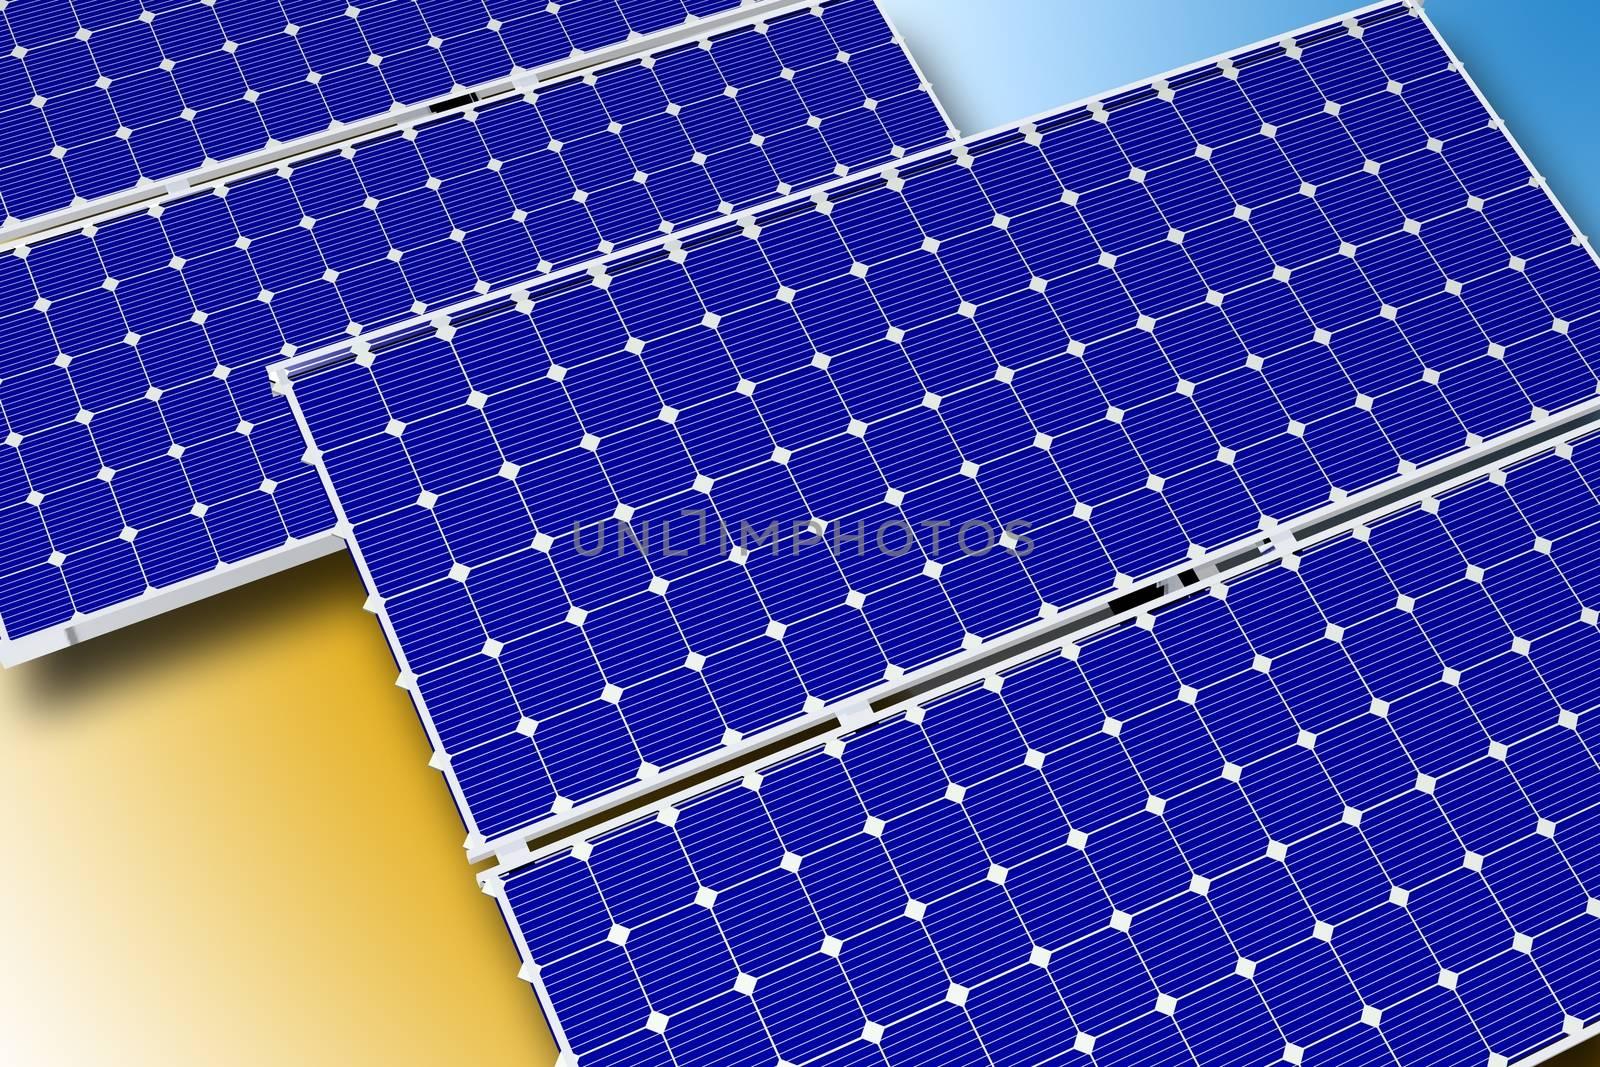 Solar Technology Theme. Photovoltaic Solar Panels. Horizontal Illustration. 3D Rendered Graphic.